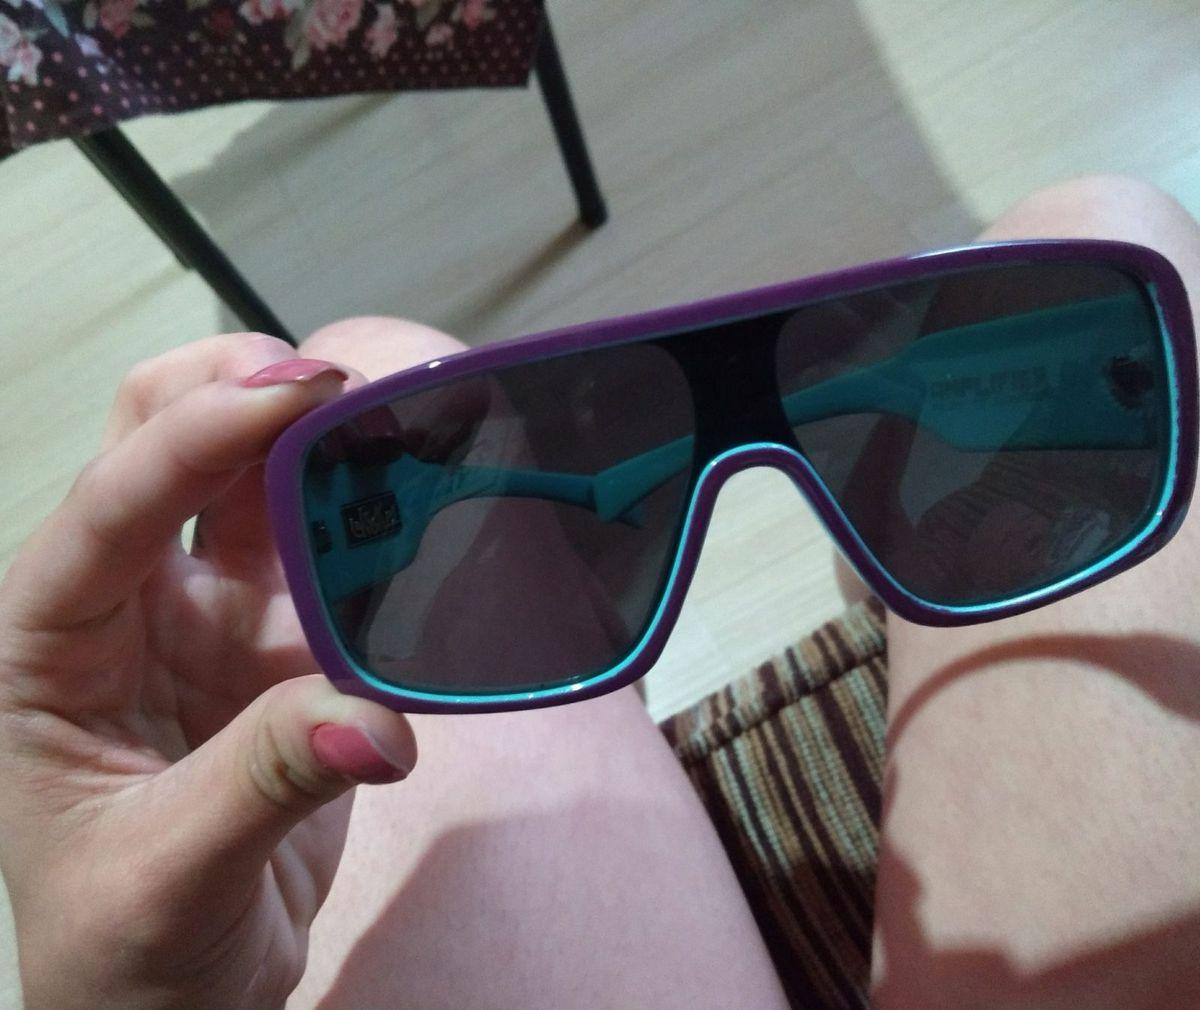 evoke amplifier - óculos evoke.  Czm6ly9wag90b3muzw5qb2vplmnvbs5ici9wcm9kdwn0cy84nda3mtu1l2nmnjlkowfimmjkzwqzyjy2ogjkn2yxn2zhndi3yzfklmpwzw  ... 908ba765e7